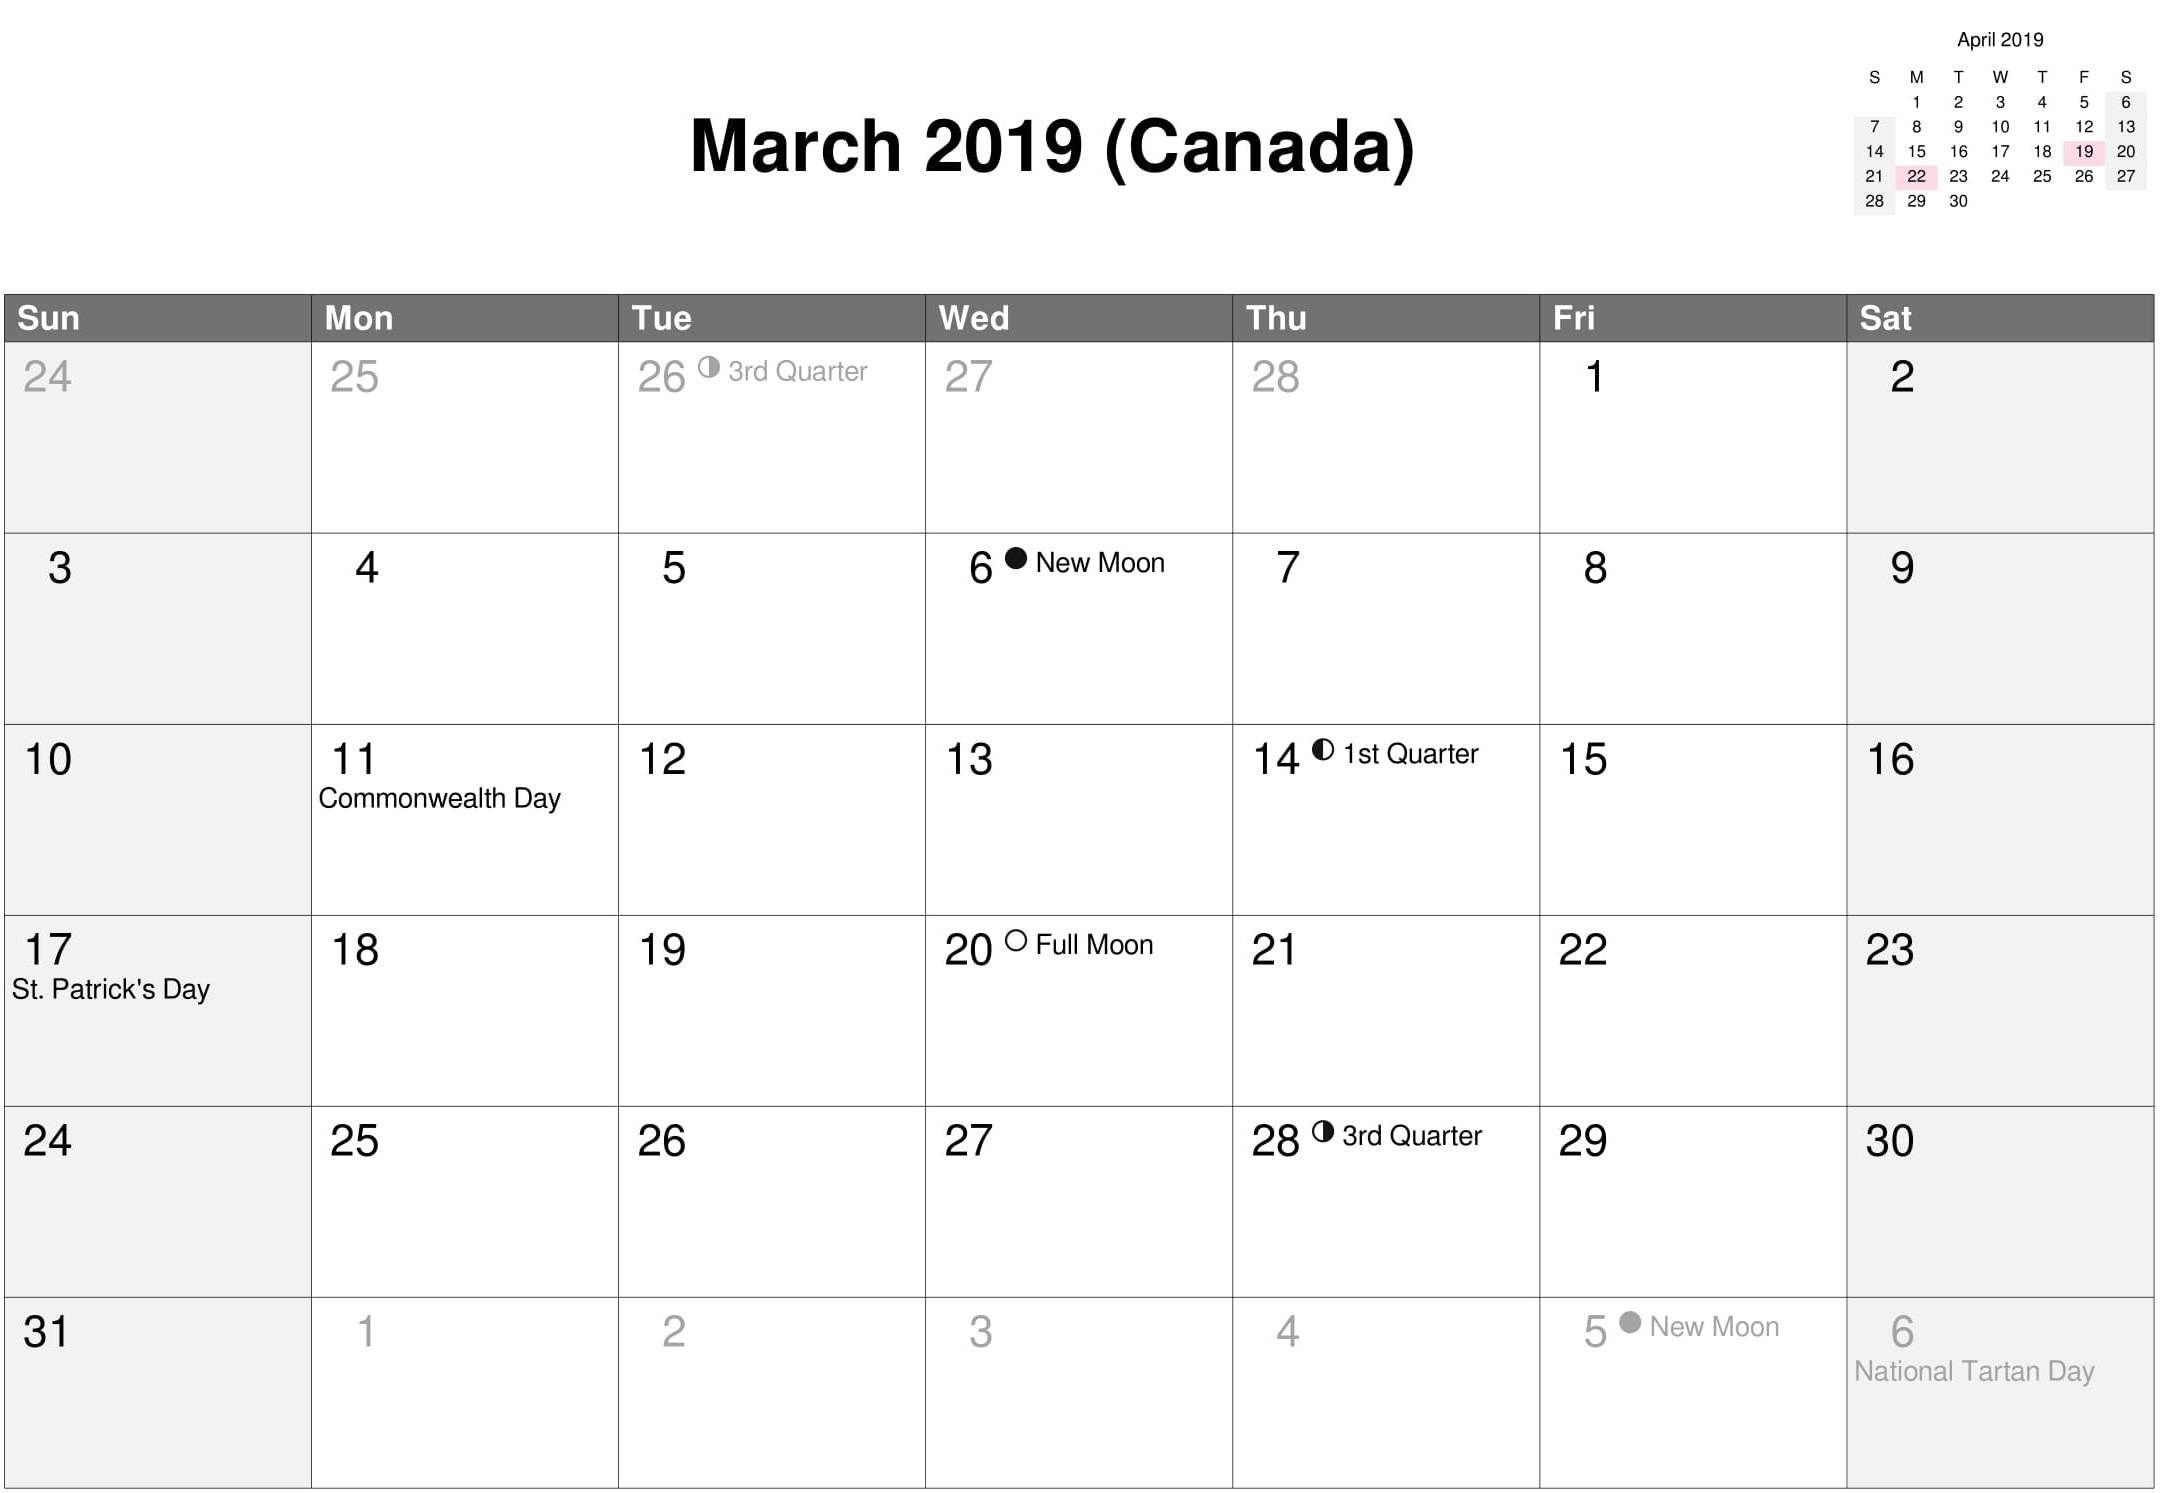 Moon Phases March 2019 Calendar Canada #march2019 #march2019Calendar